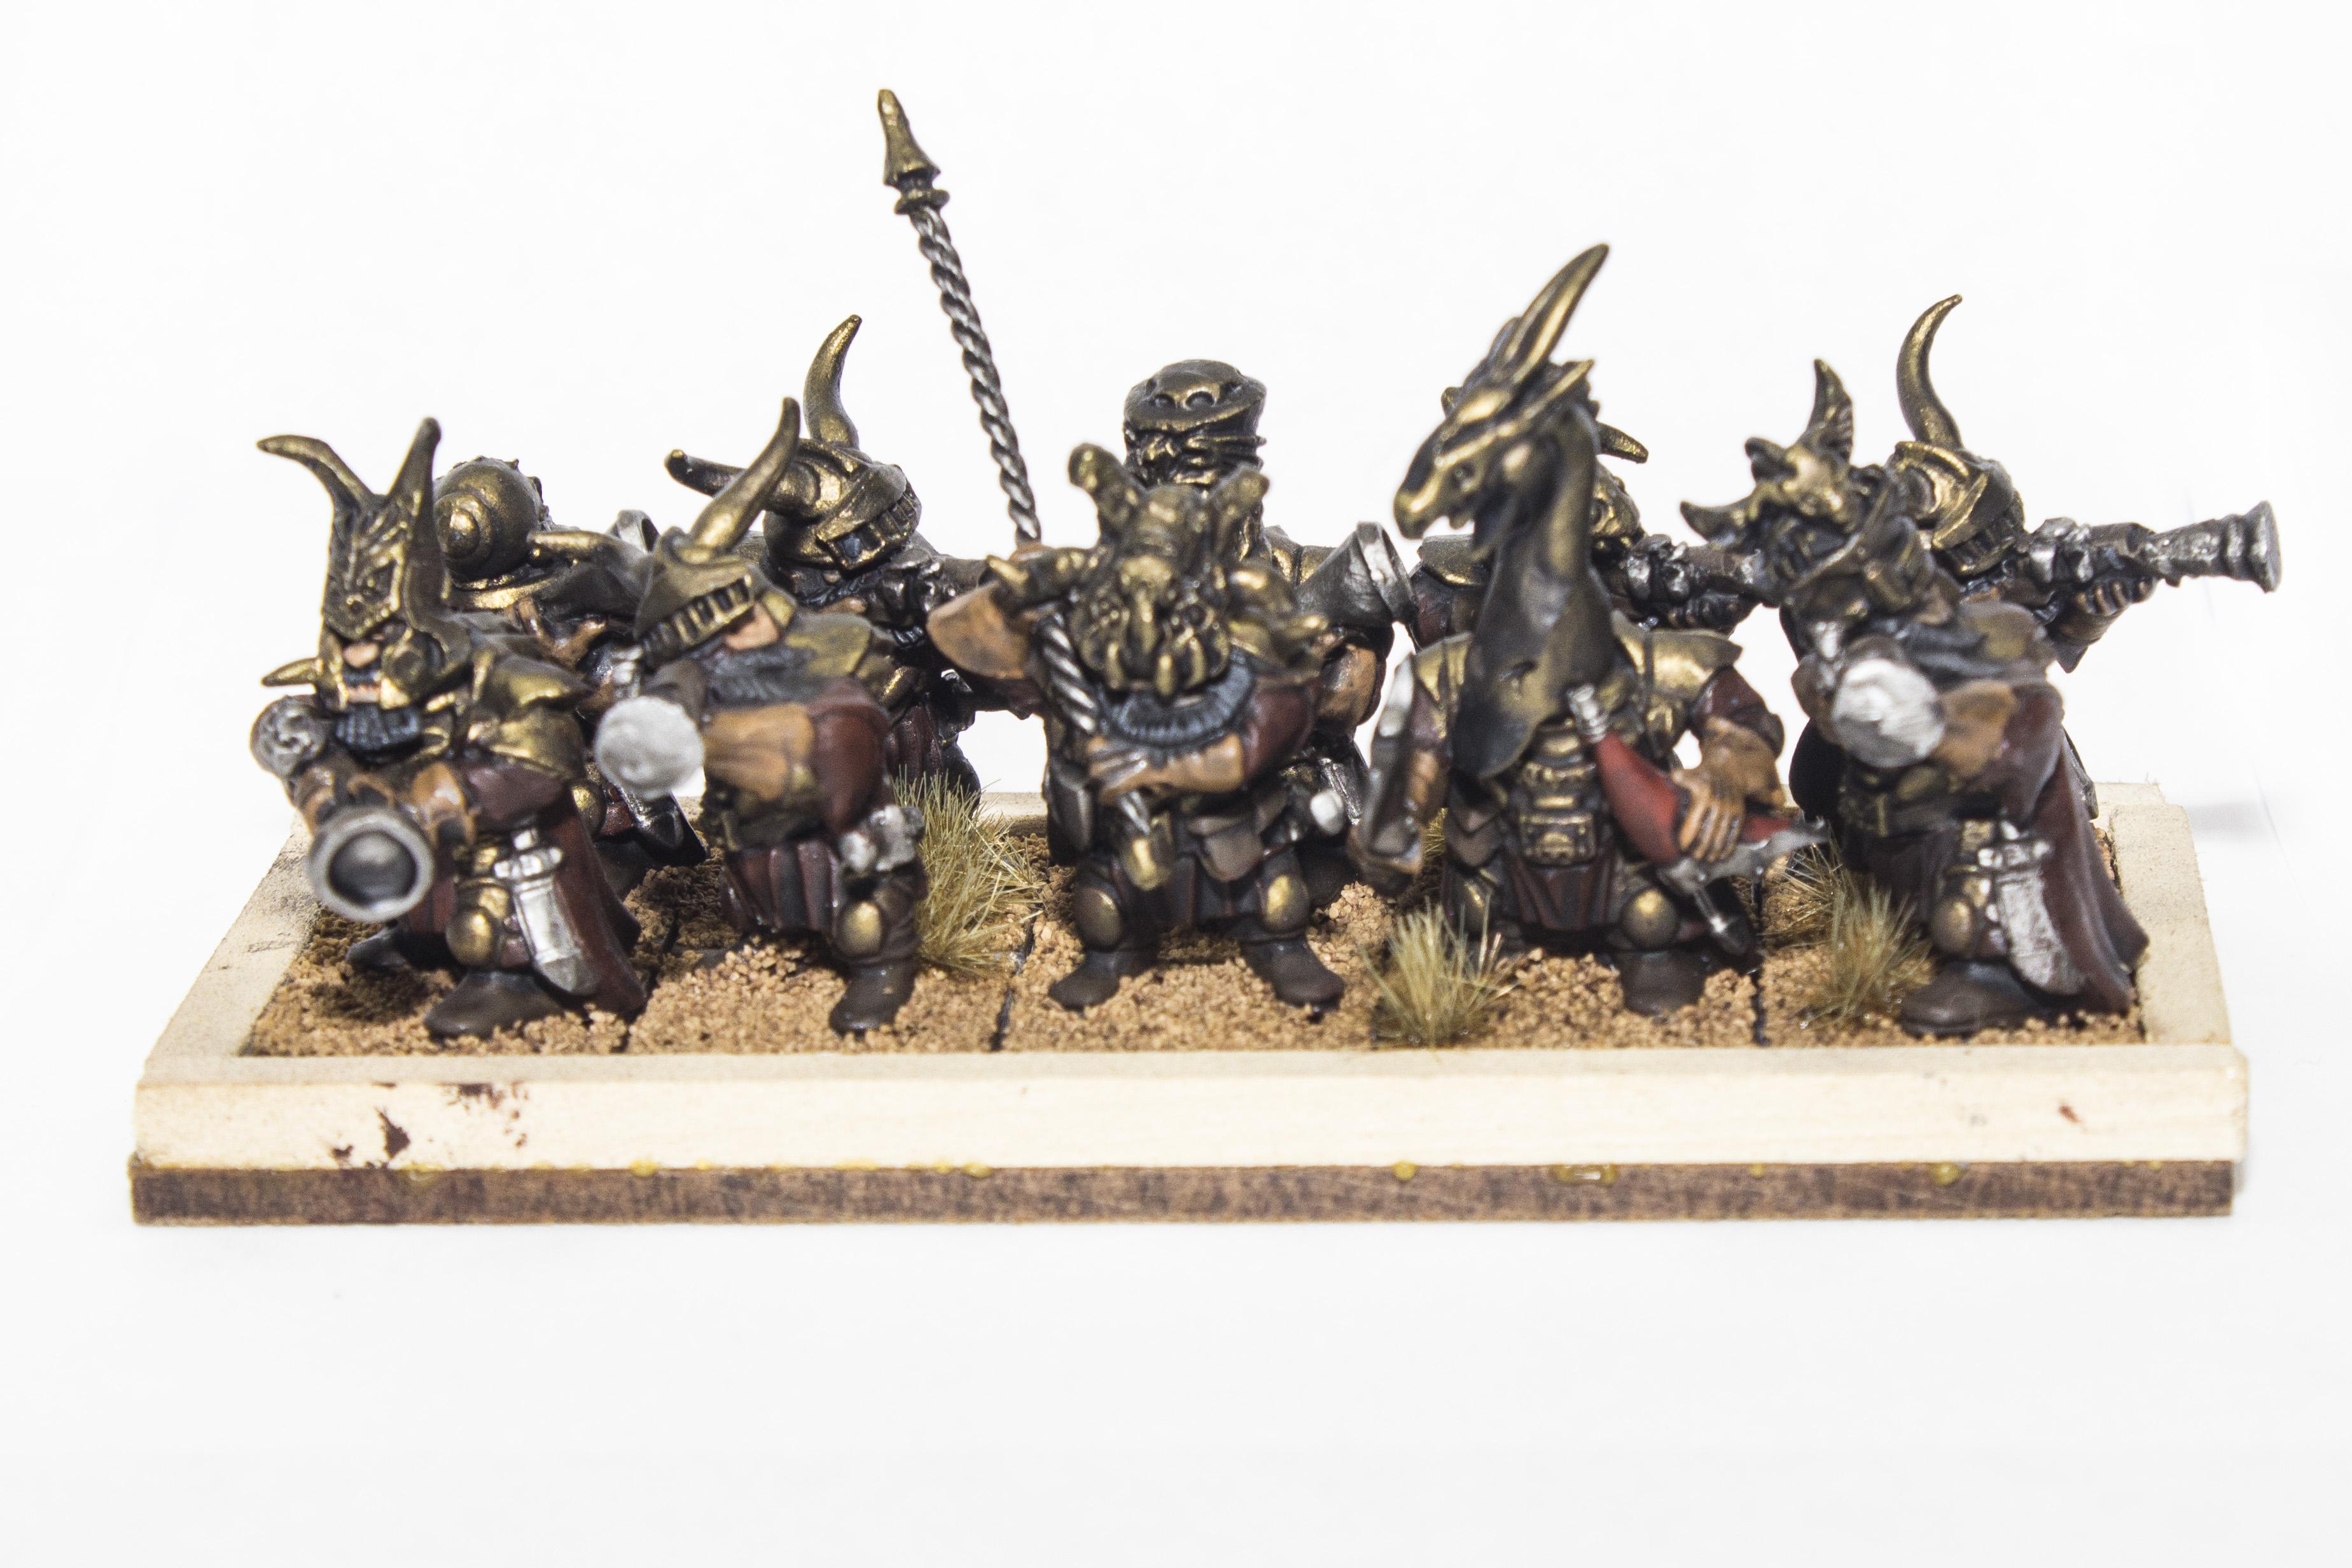 Abyssal_Dwarves_Decimators_1